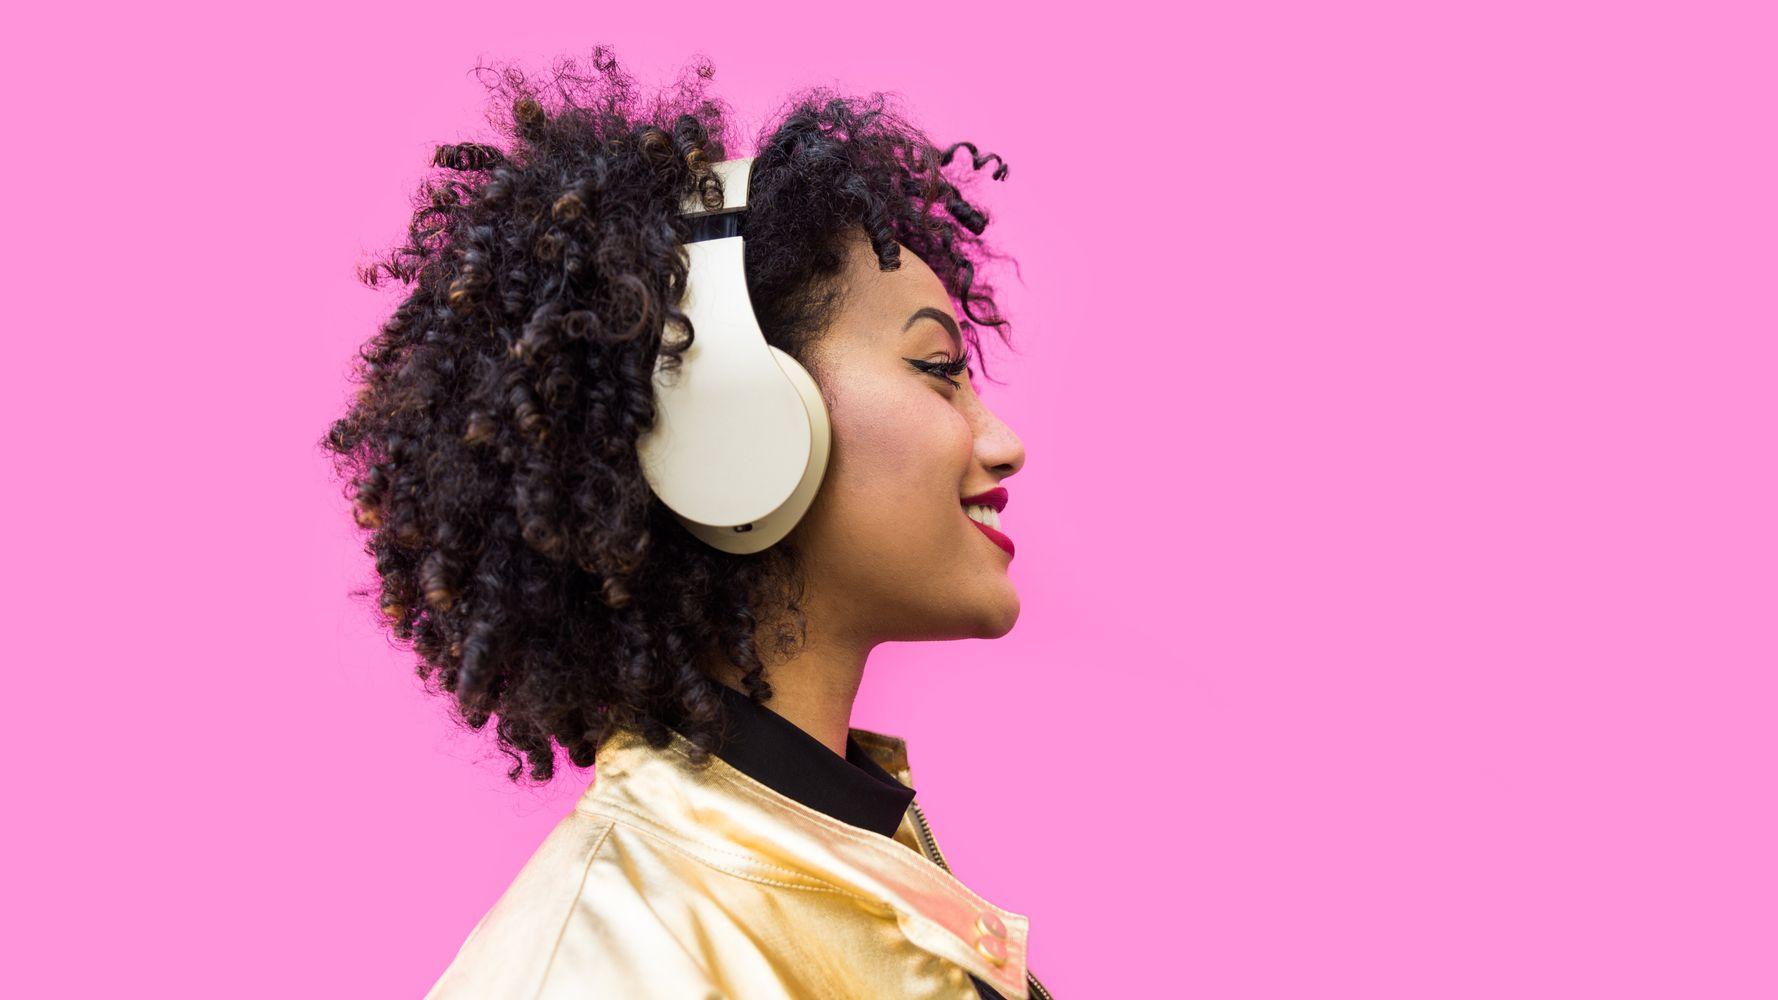 Black Friday 2020 Headphones Deals: Apple, Bose, Beats, Jabra And More